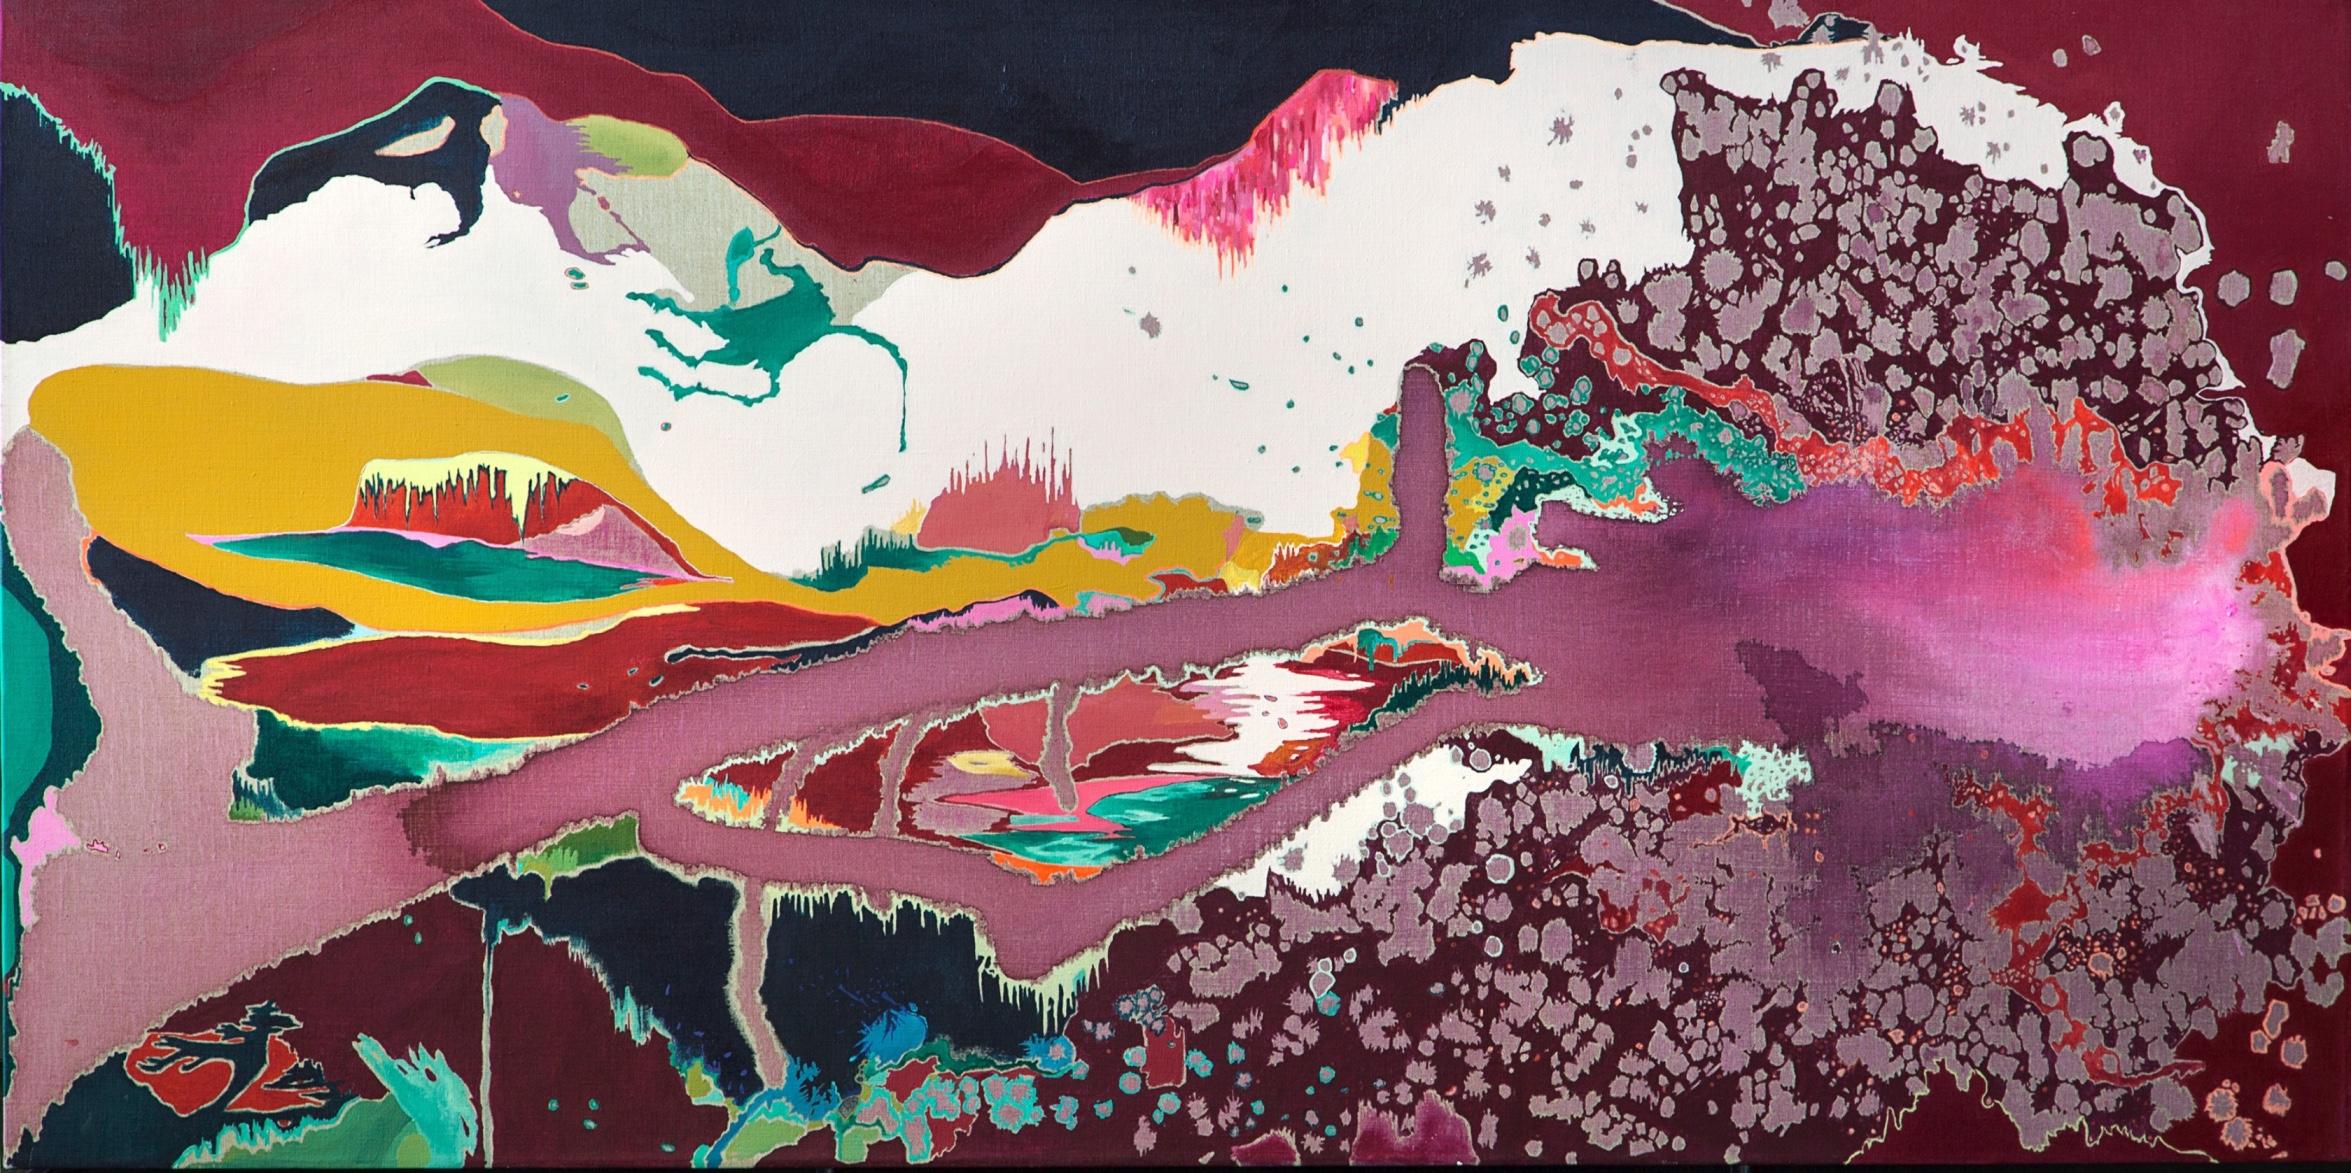 Wonderland V by Beatriz Morales